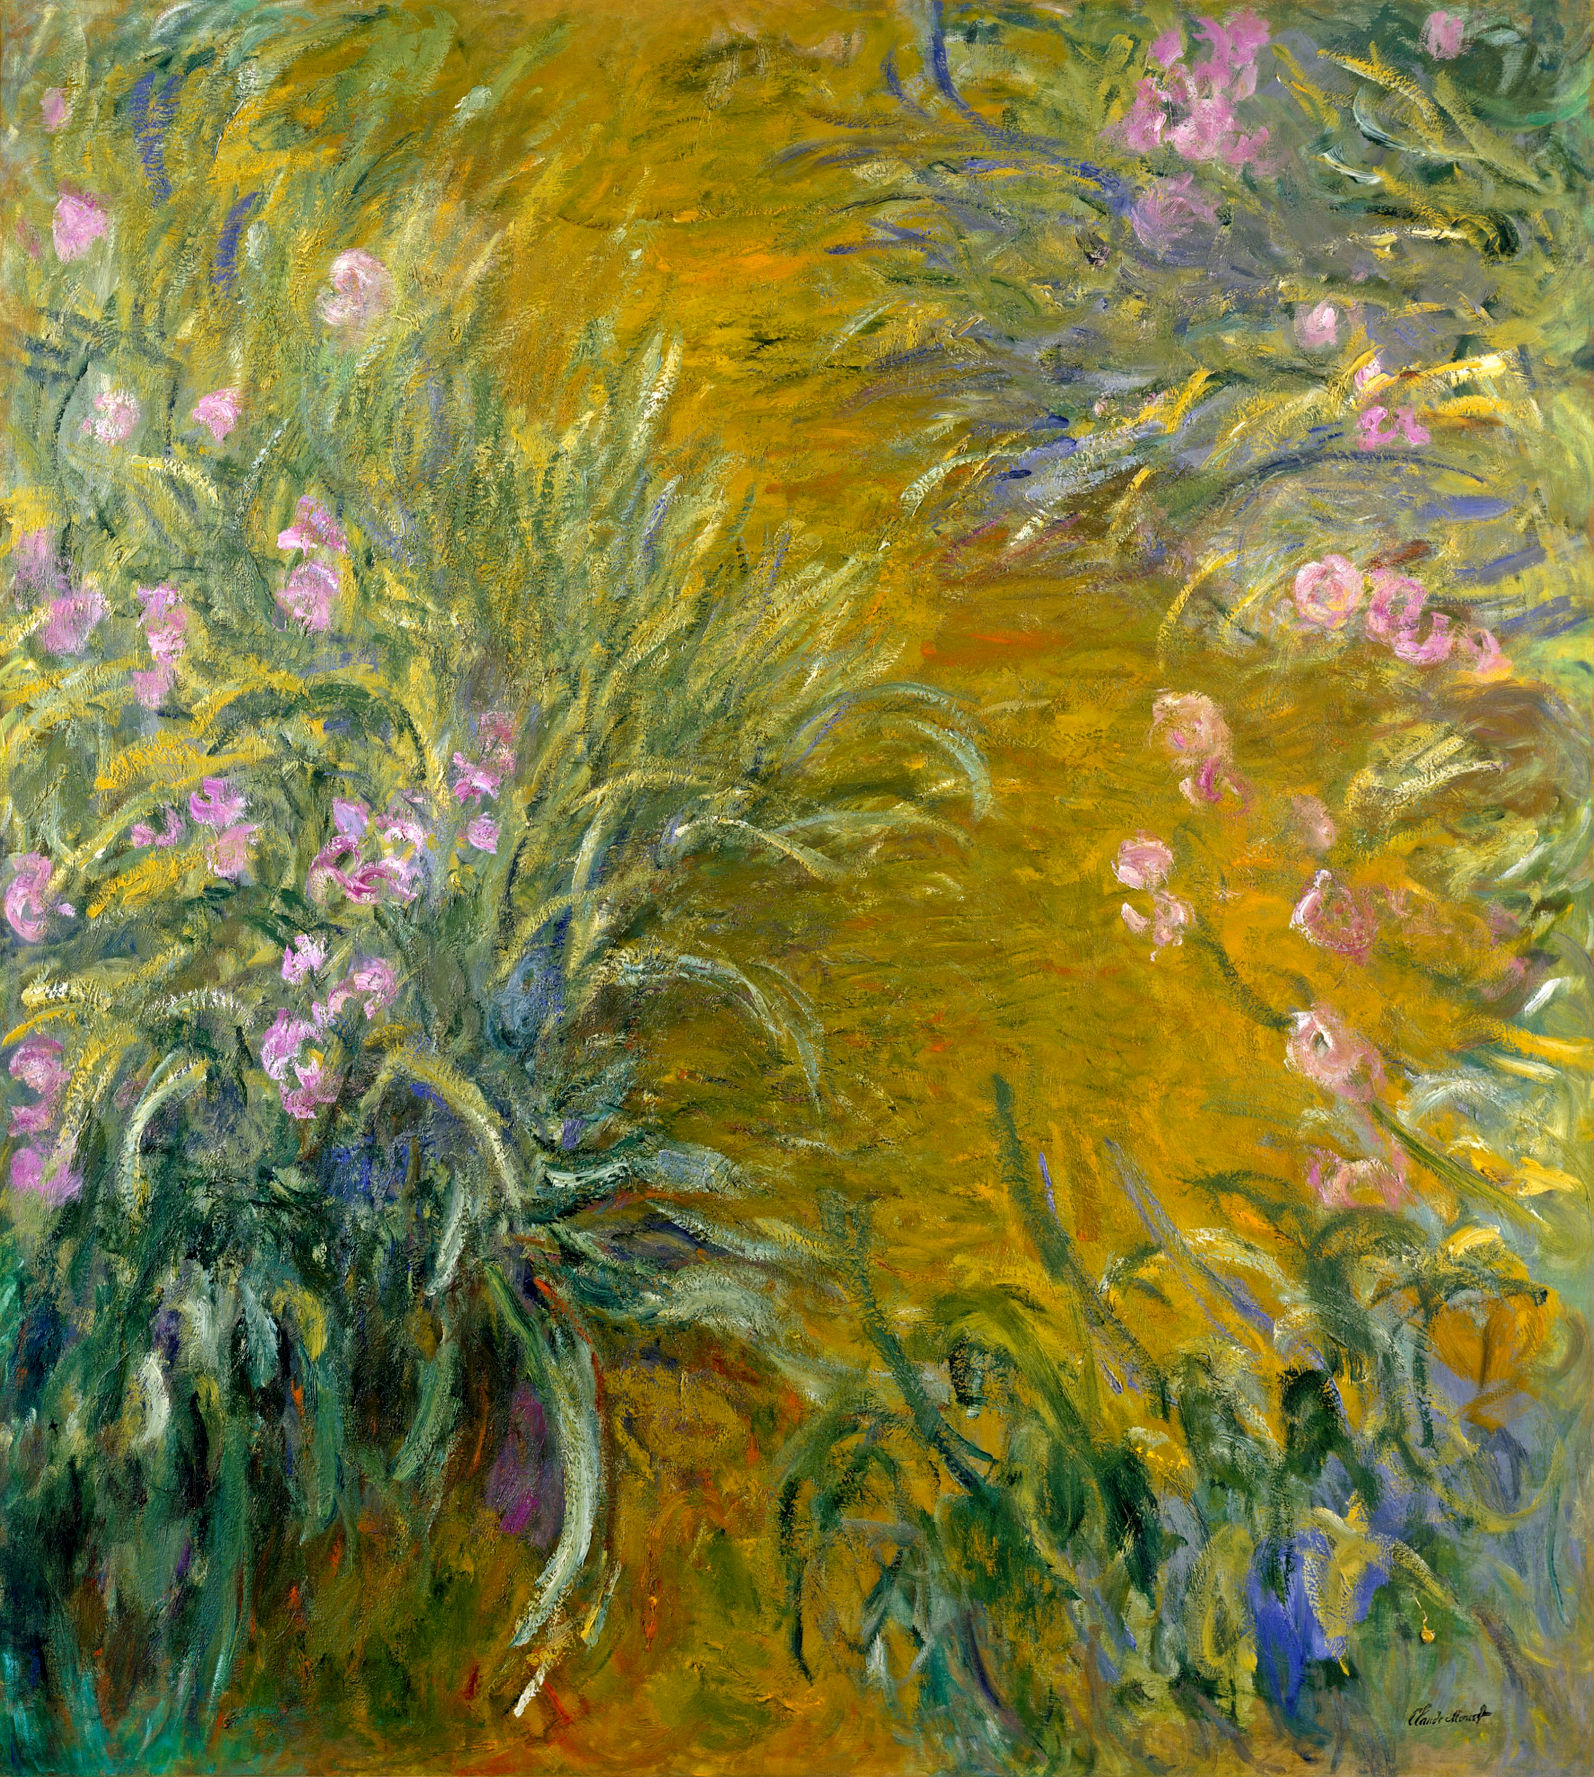 пейзаж < Тропа и ирисы >:: Клод Моне, описание картины - Моне Клод (Claude Monet) фото